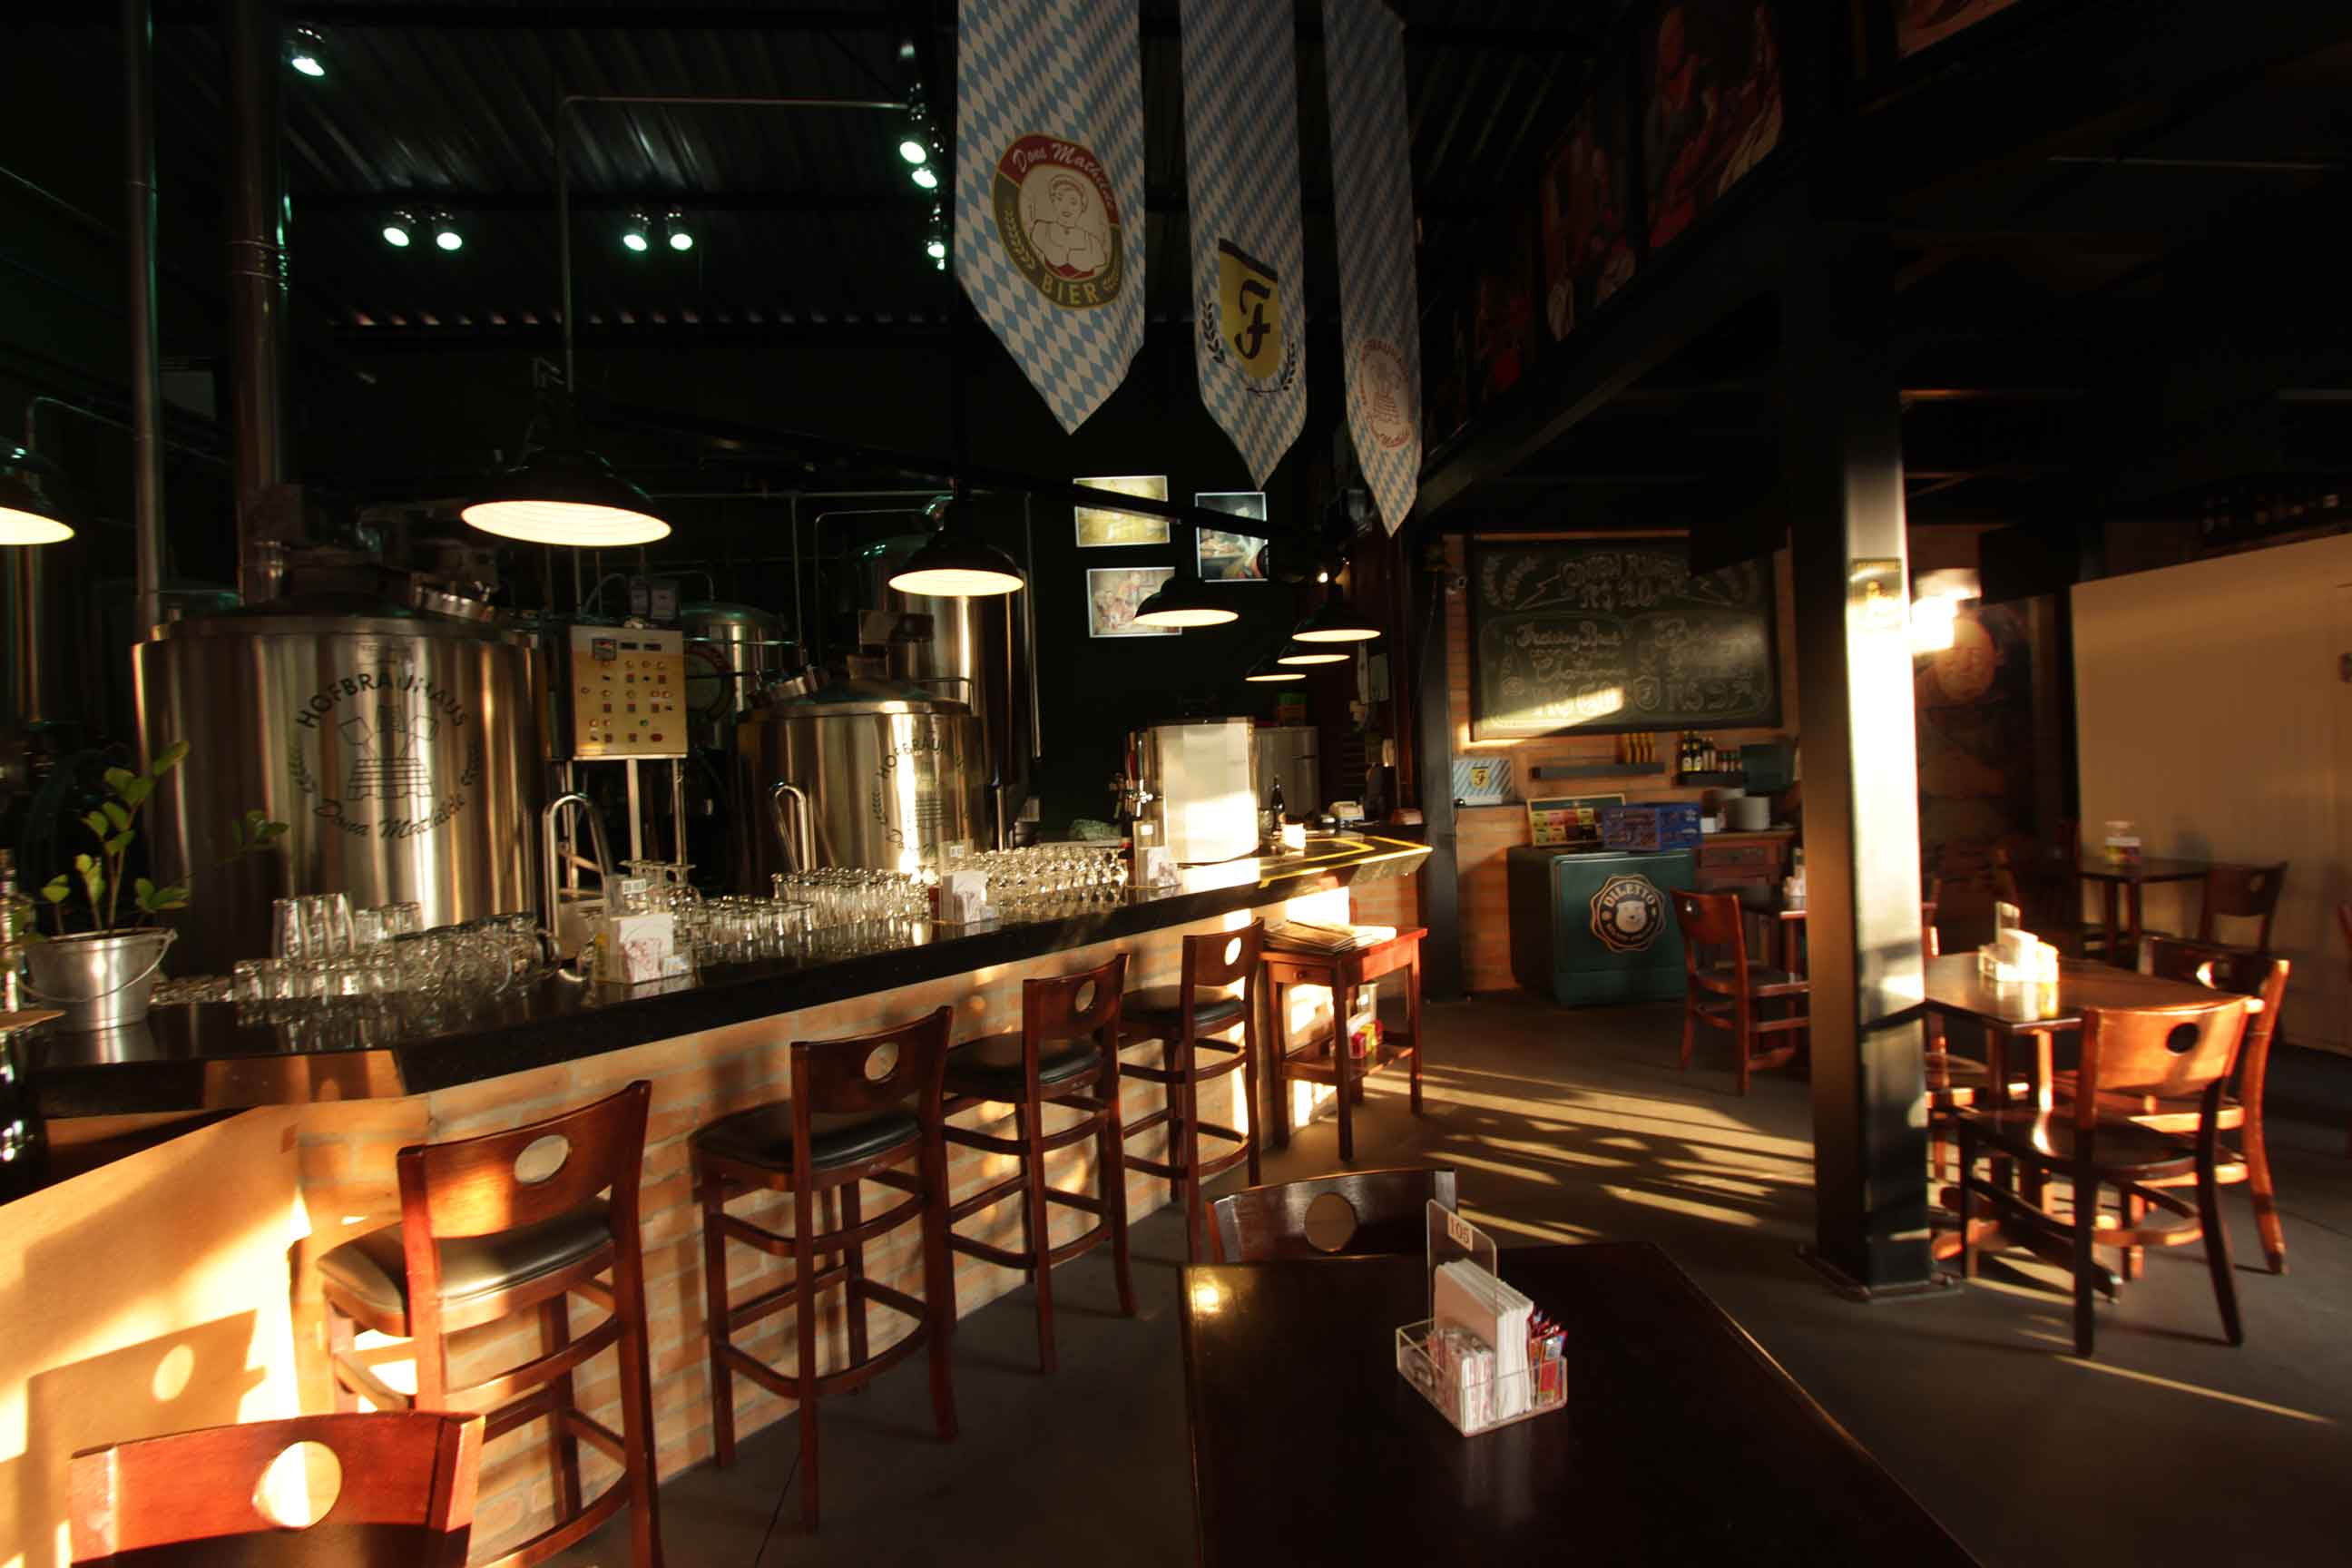 Itatiba-gastronomia-cervejaria-freising-bier-IMG_8920-bx